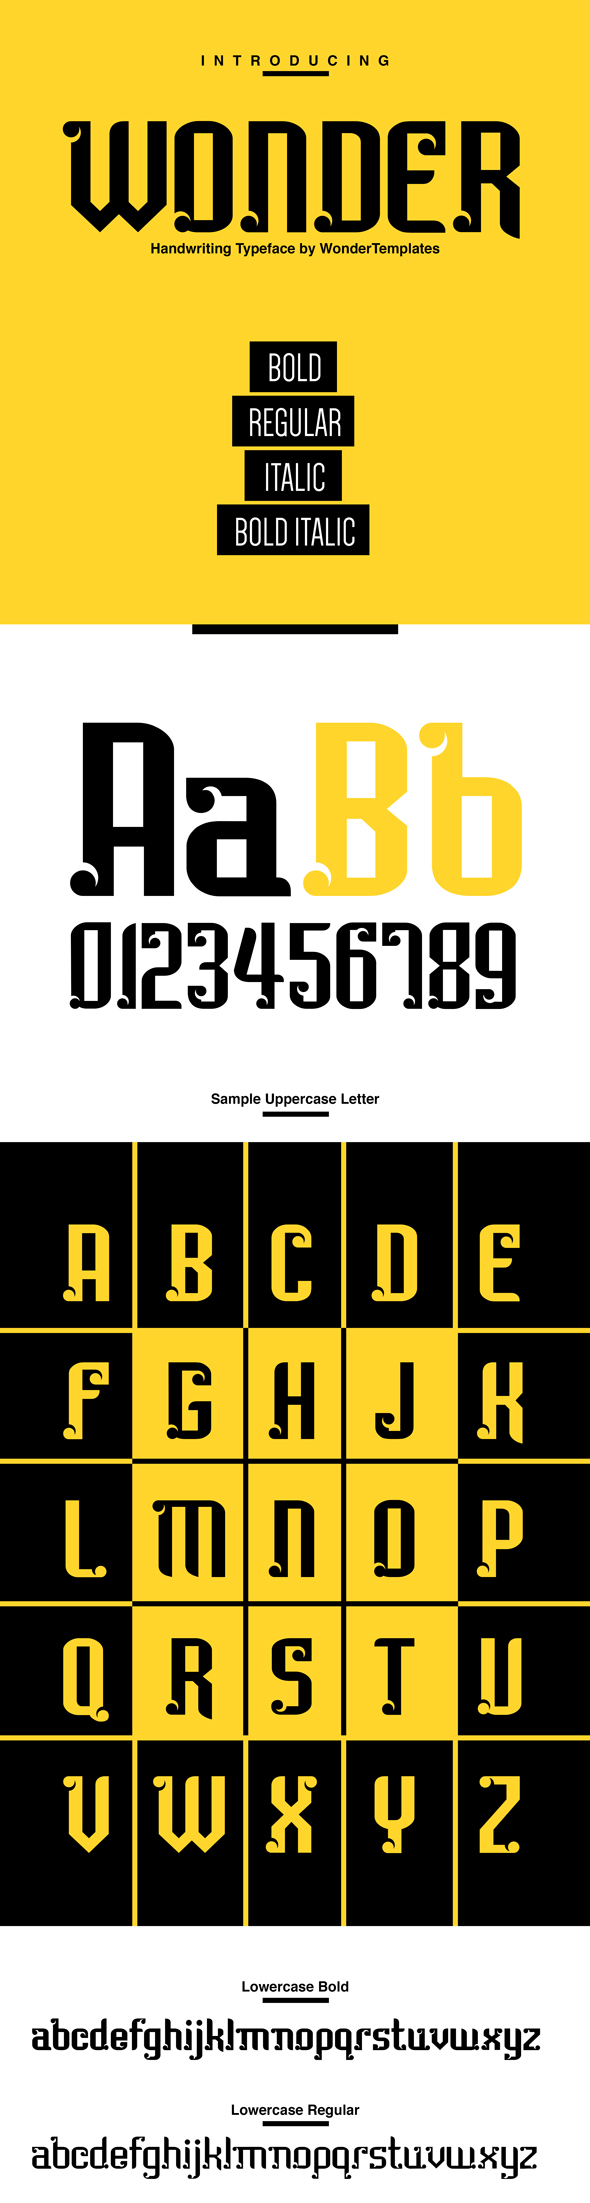 WonderTemplates-Handwritten Typeface - Handwriting Fonts